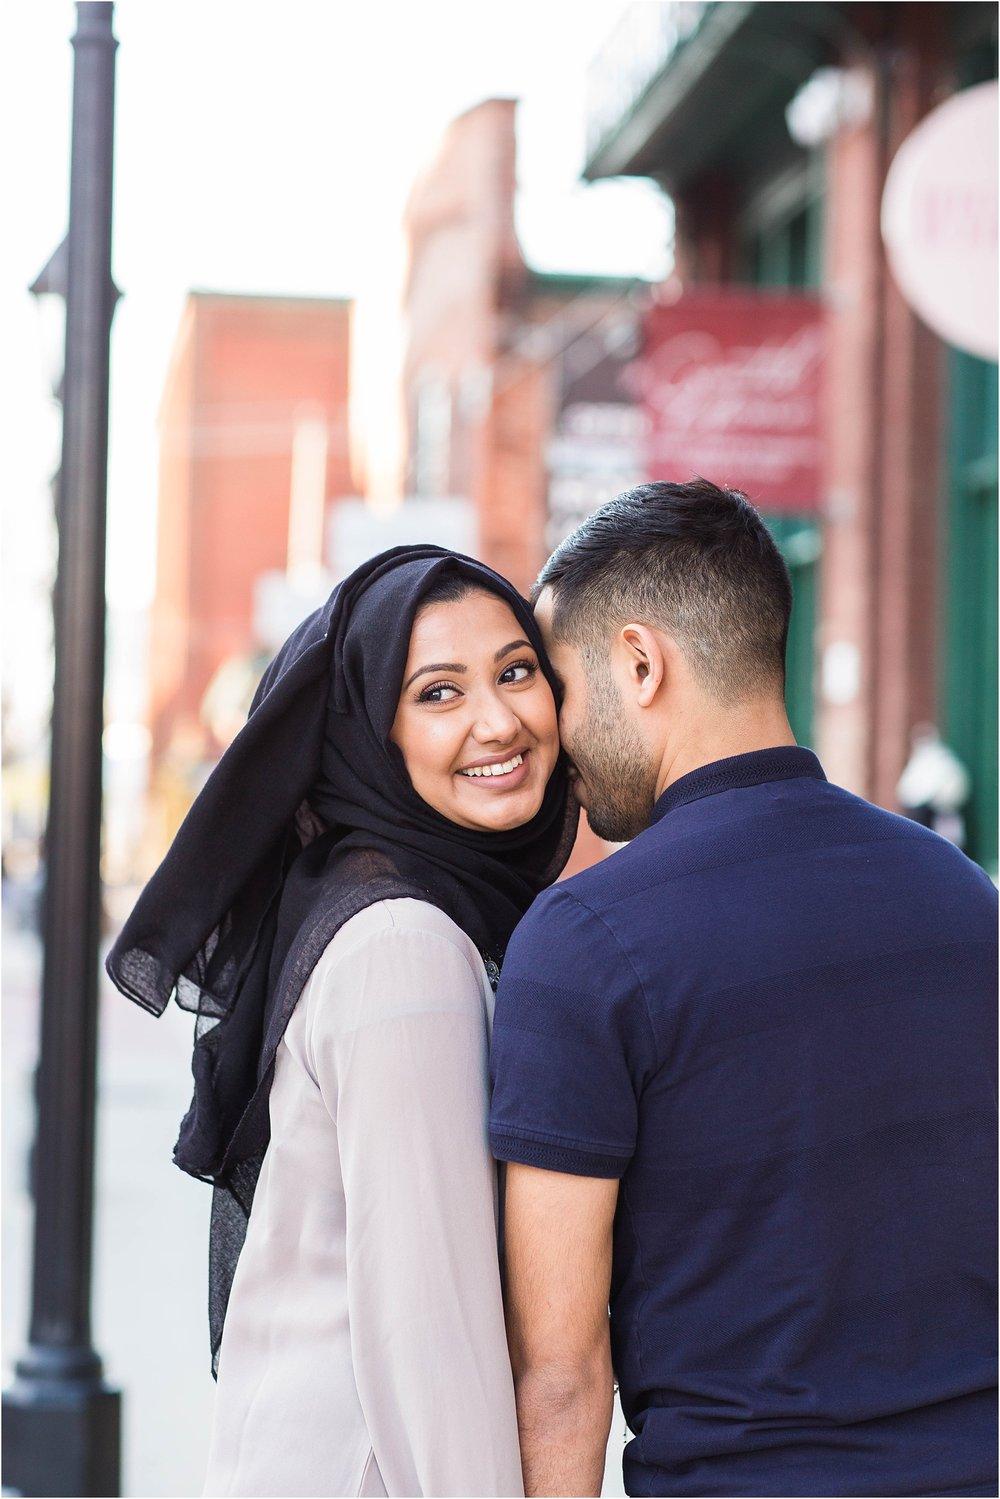 Distillery-District-Humber-Bay-Park-Engagement-Toronto-Mississauga-Brampton-Scarborough-GTA-Pakistani-Indian-Wedding-Engagement-Photographer-Photography_0016.jpg